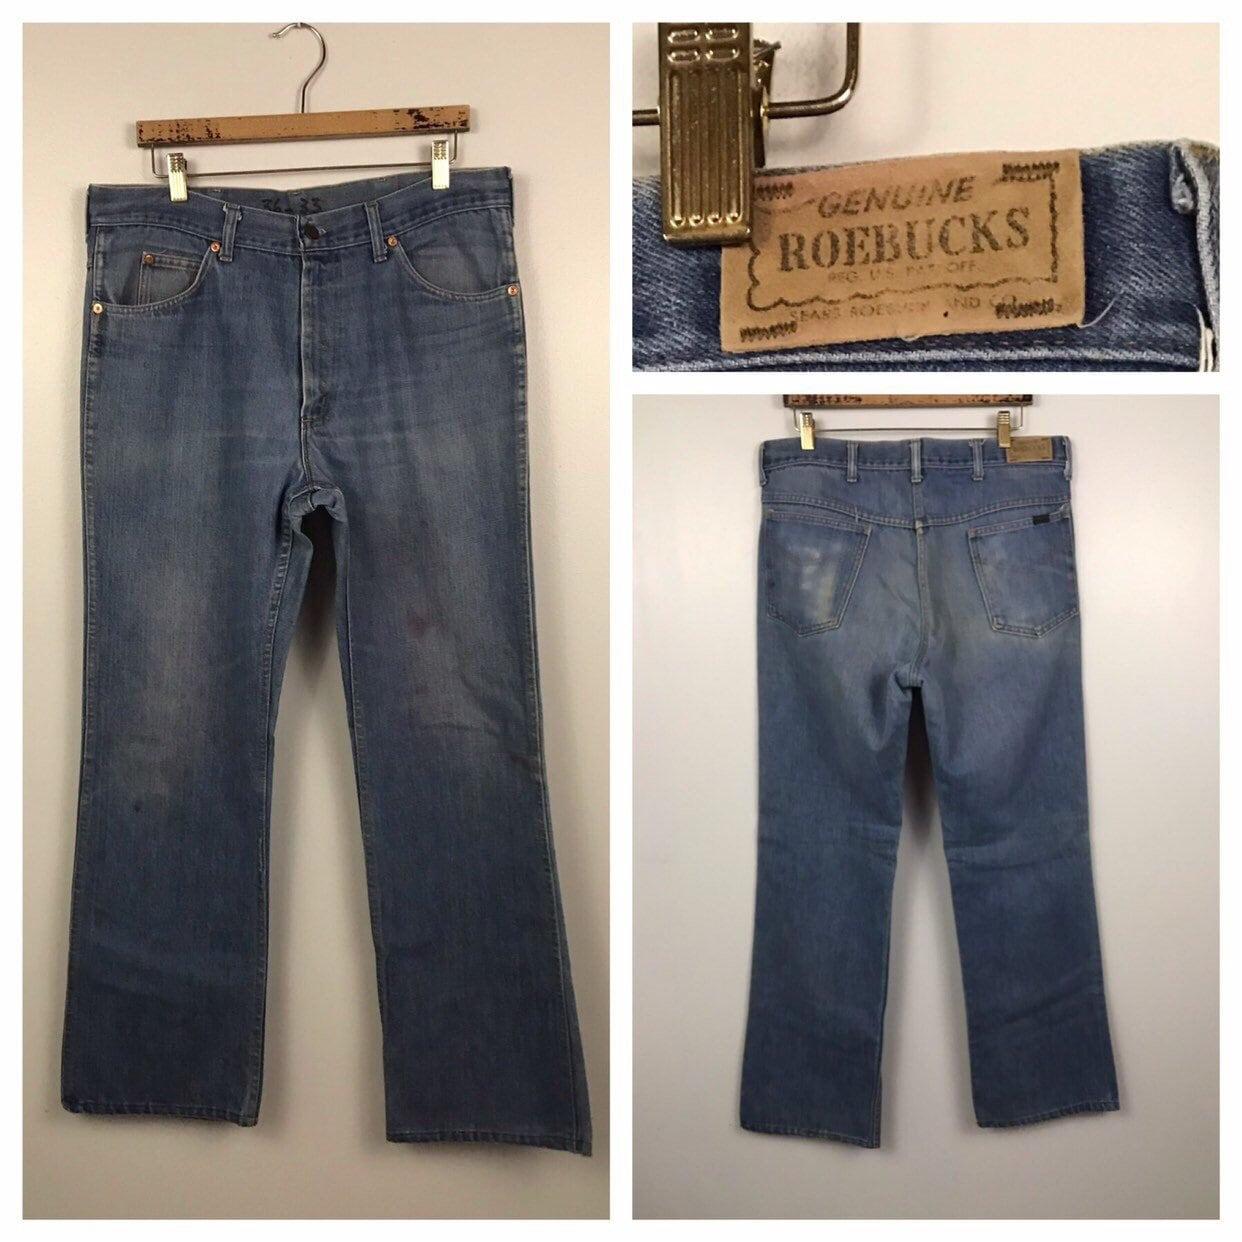 1960s – 70s Men's Ties | Skinny Ties, Slim Ties 1960S Blue Roebucks Rare Denim Jeans60S 70S Retro Distressed Straight Leg Pants Mens 36x33 $65.62 AT vintagedancer.com